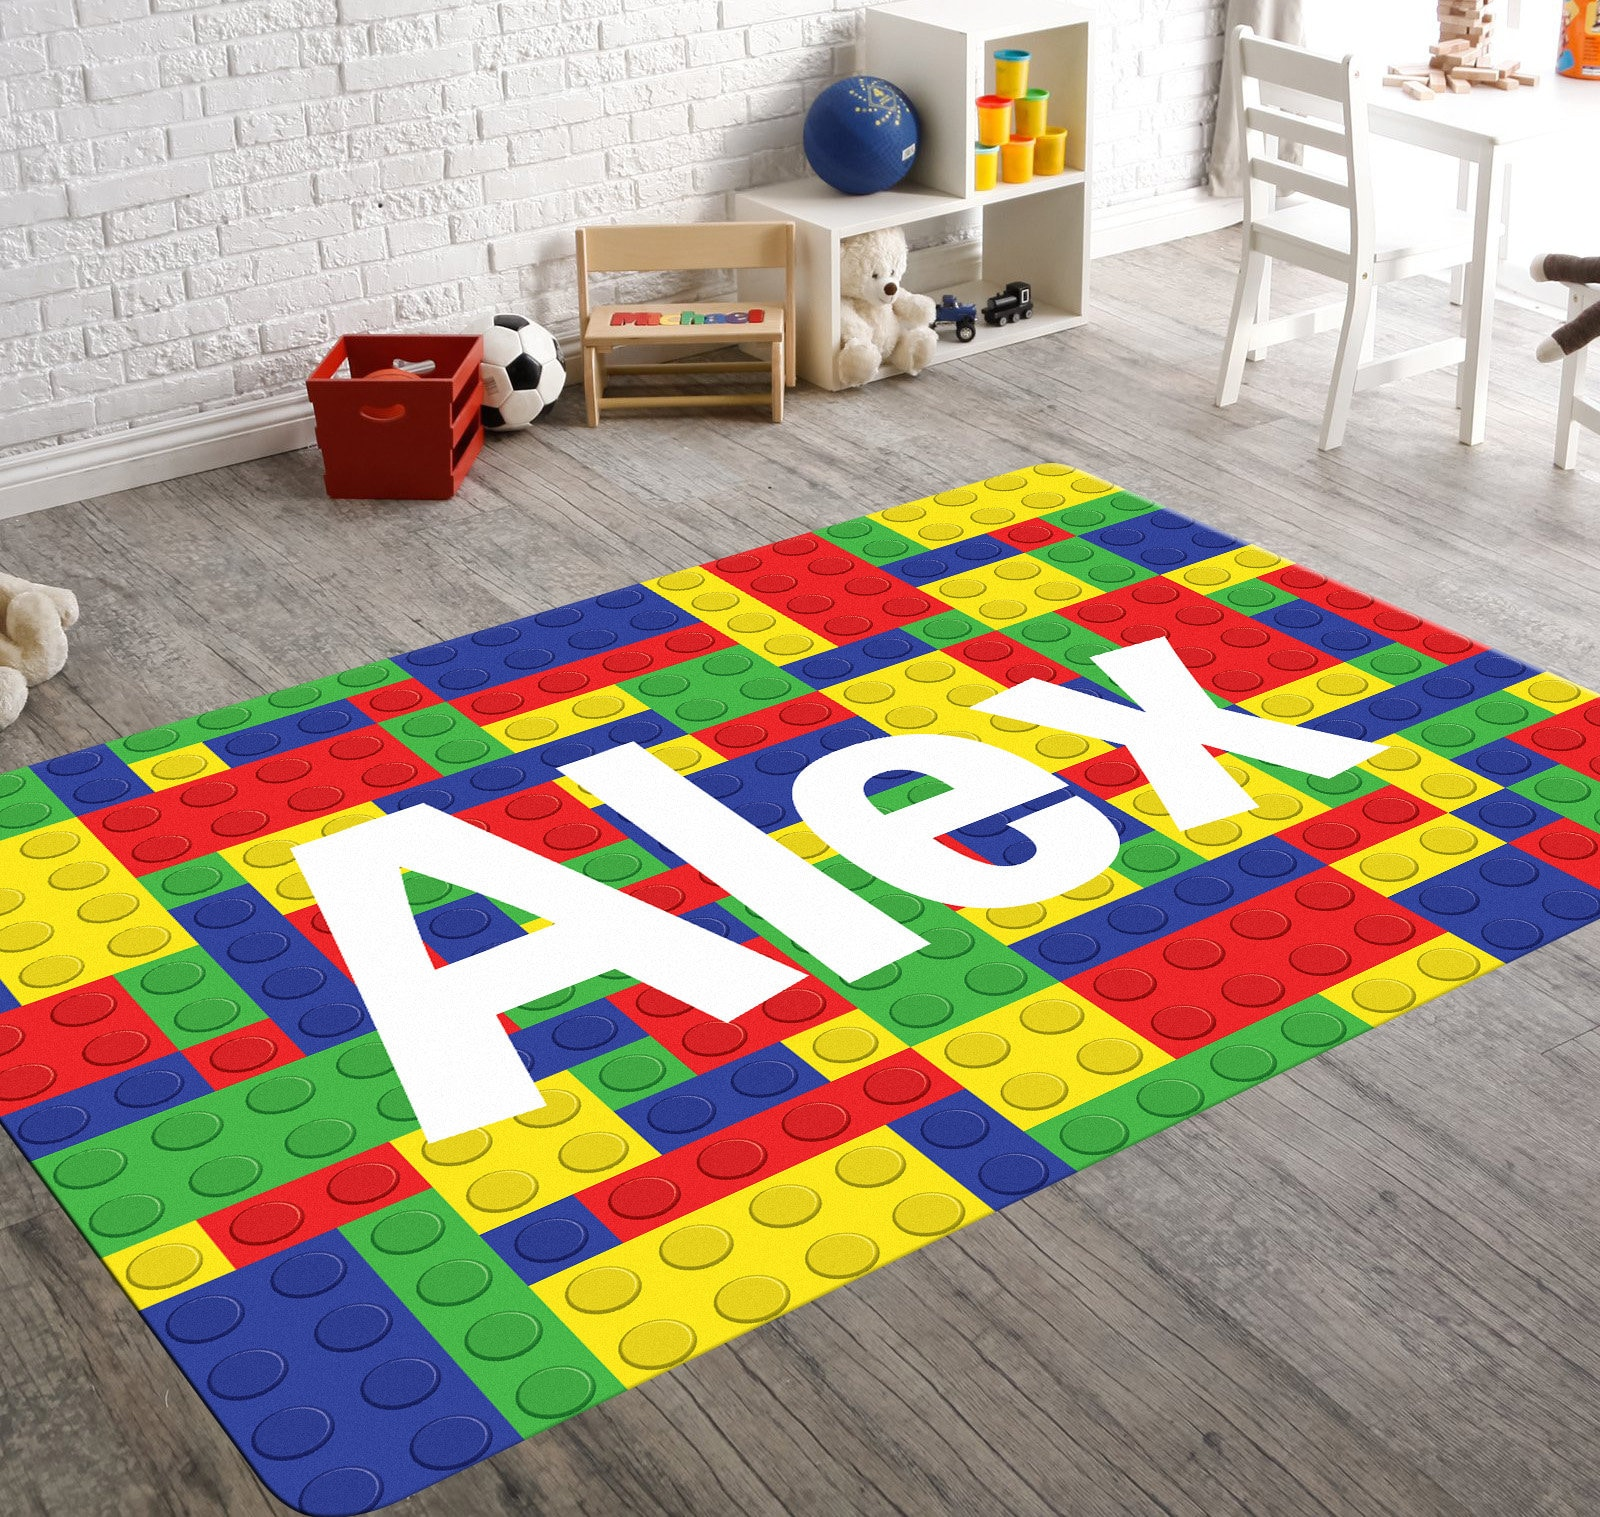 Kids Room Rugs: Lego Rug Lego Nursery Nursery Rug Game Room Rug Kids Rugs